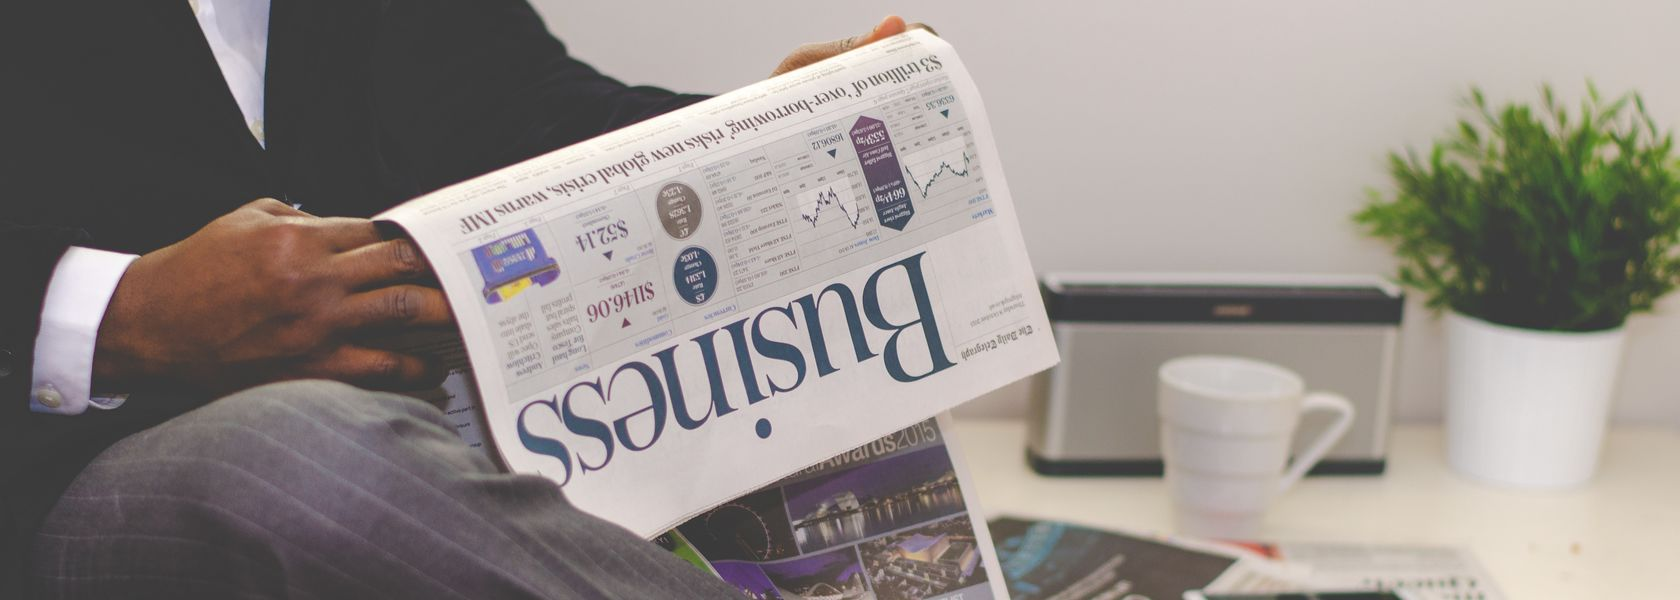 News Wrap - MiningNews net